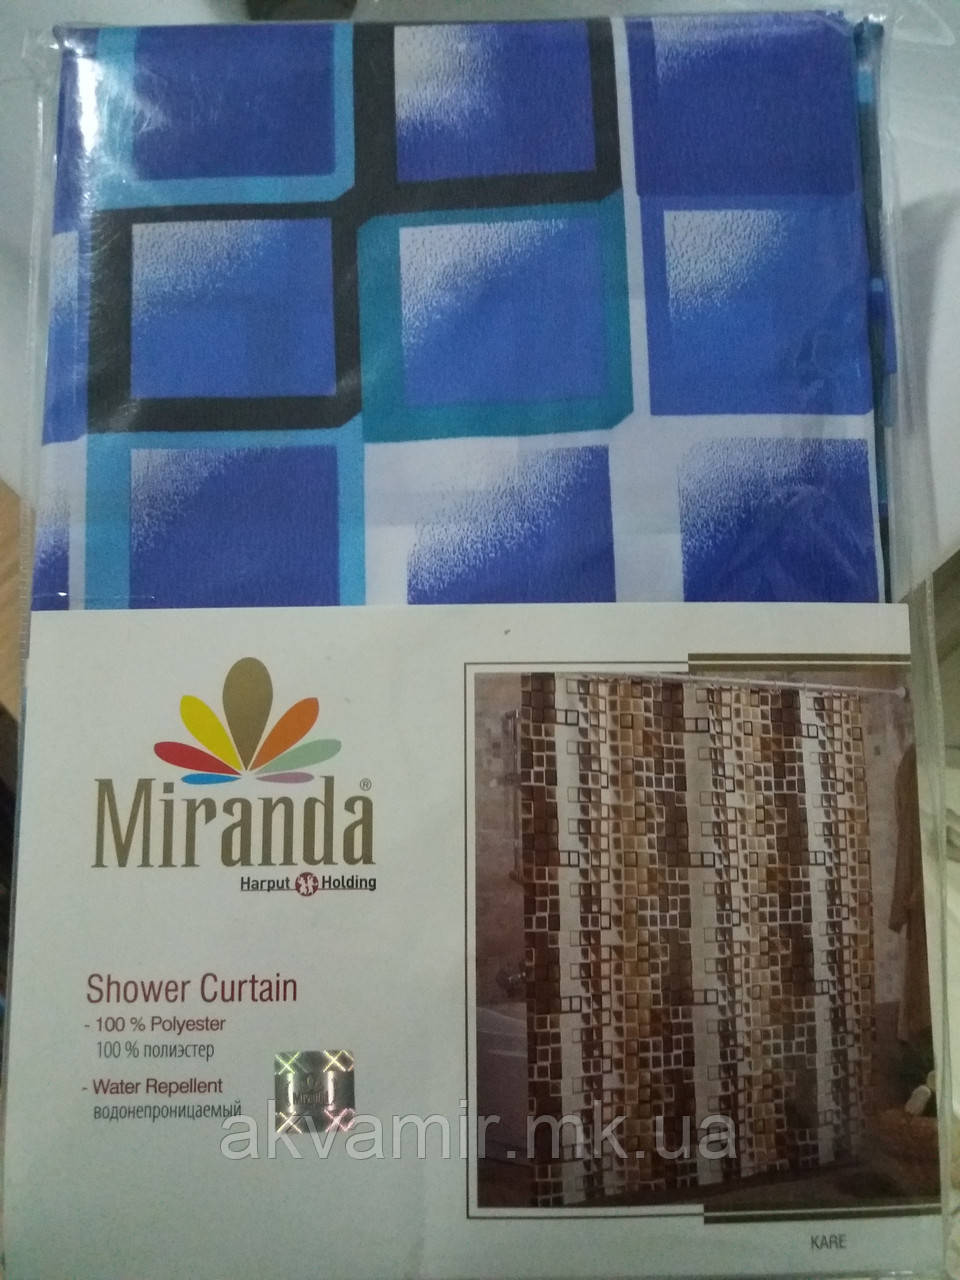 Штора в ванную  Miranda KARE (Турция) 180х200 см синяя